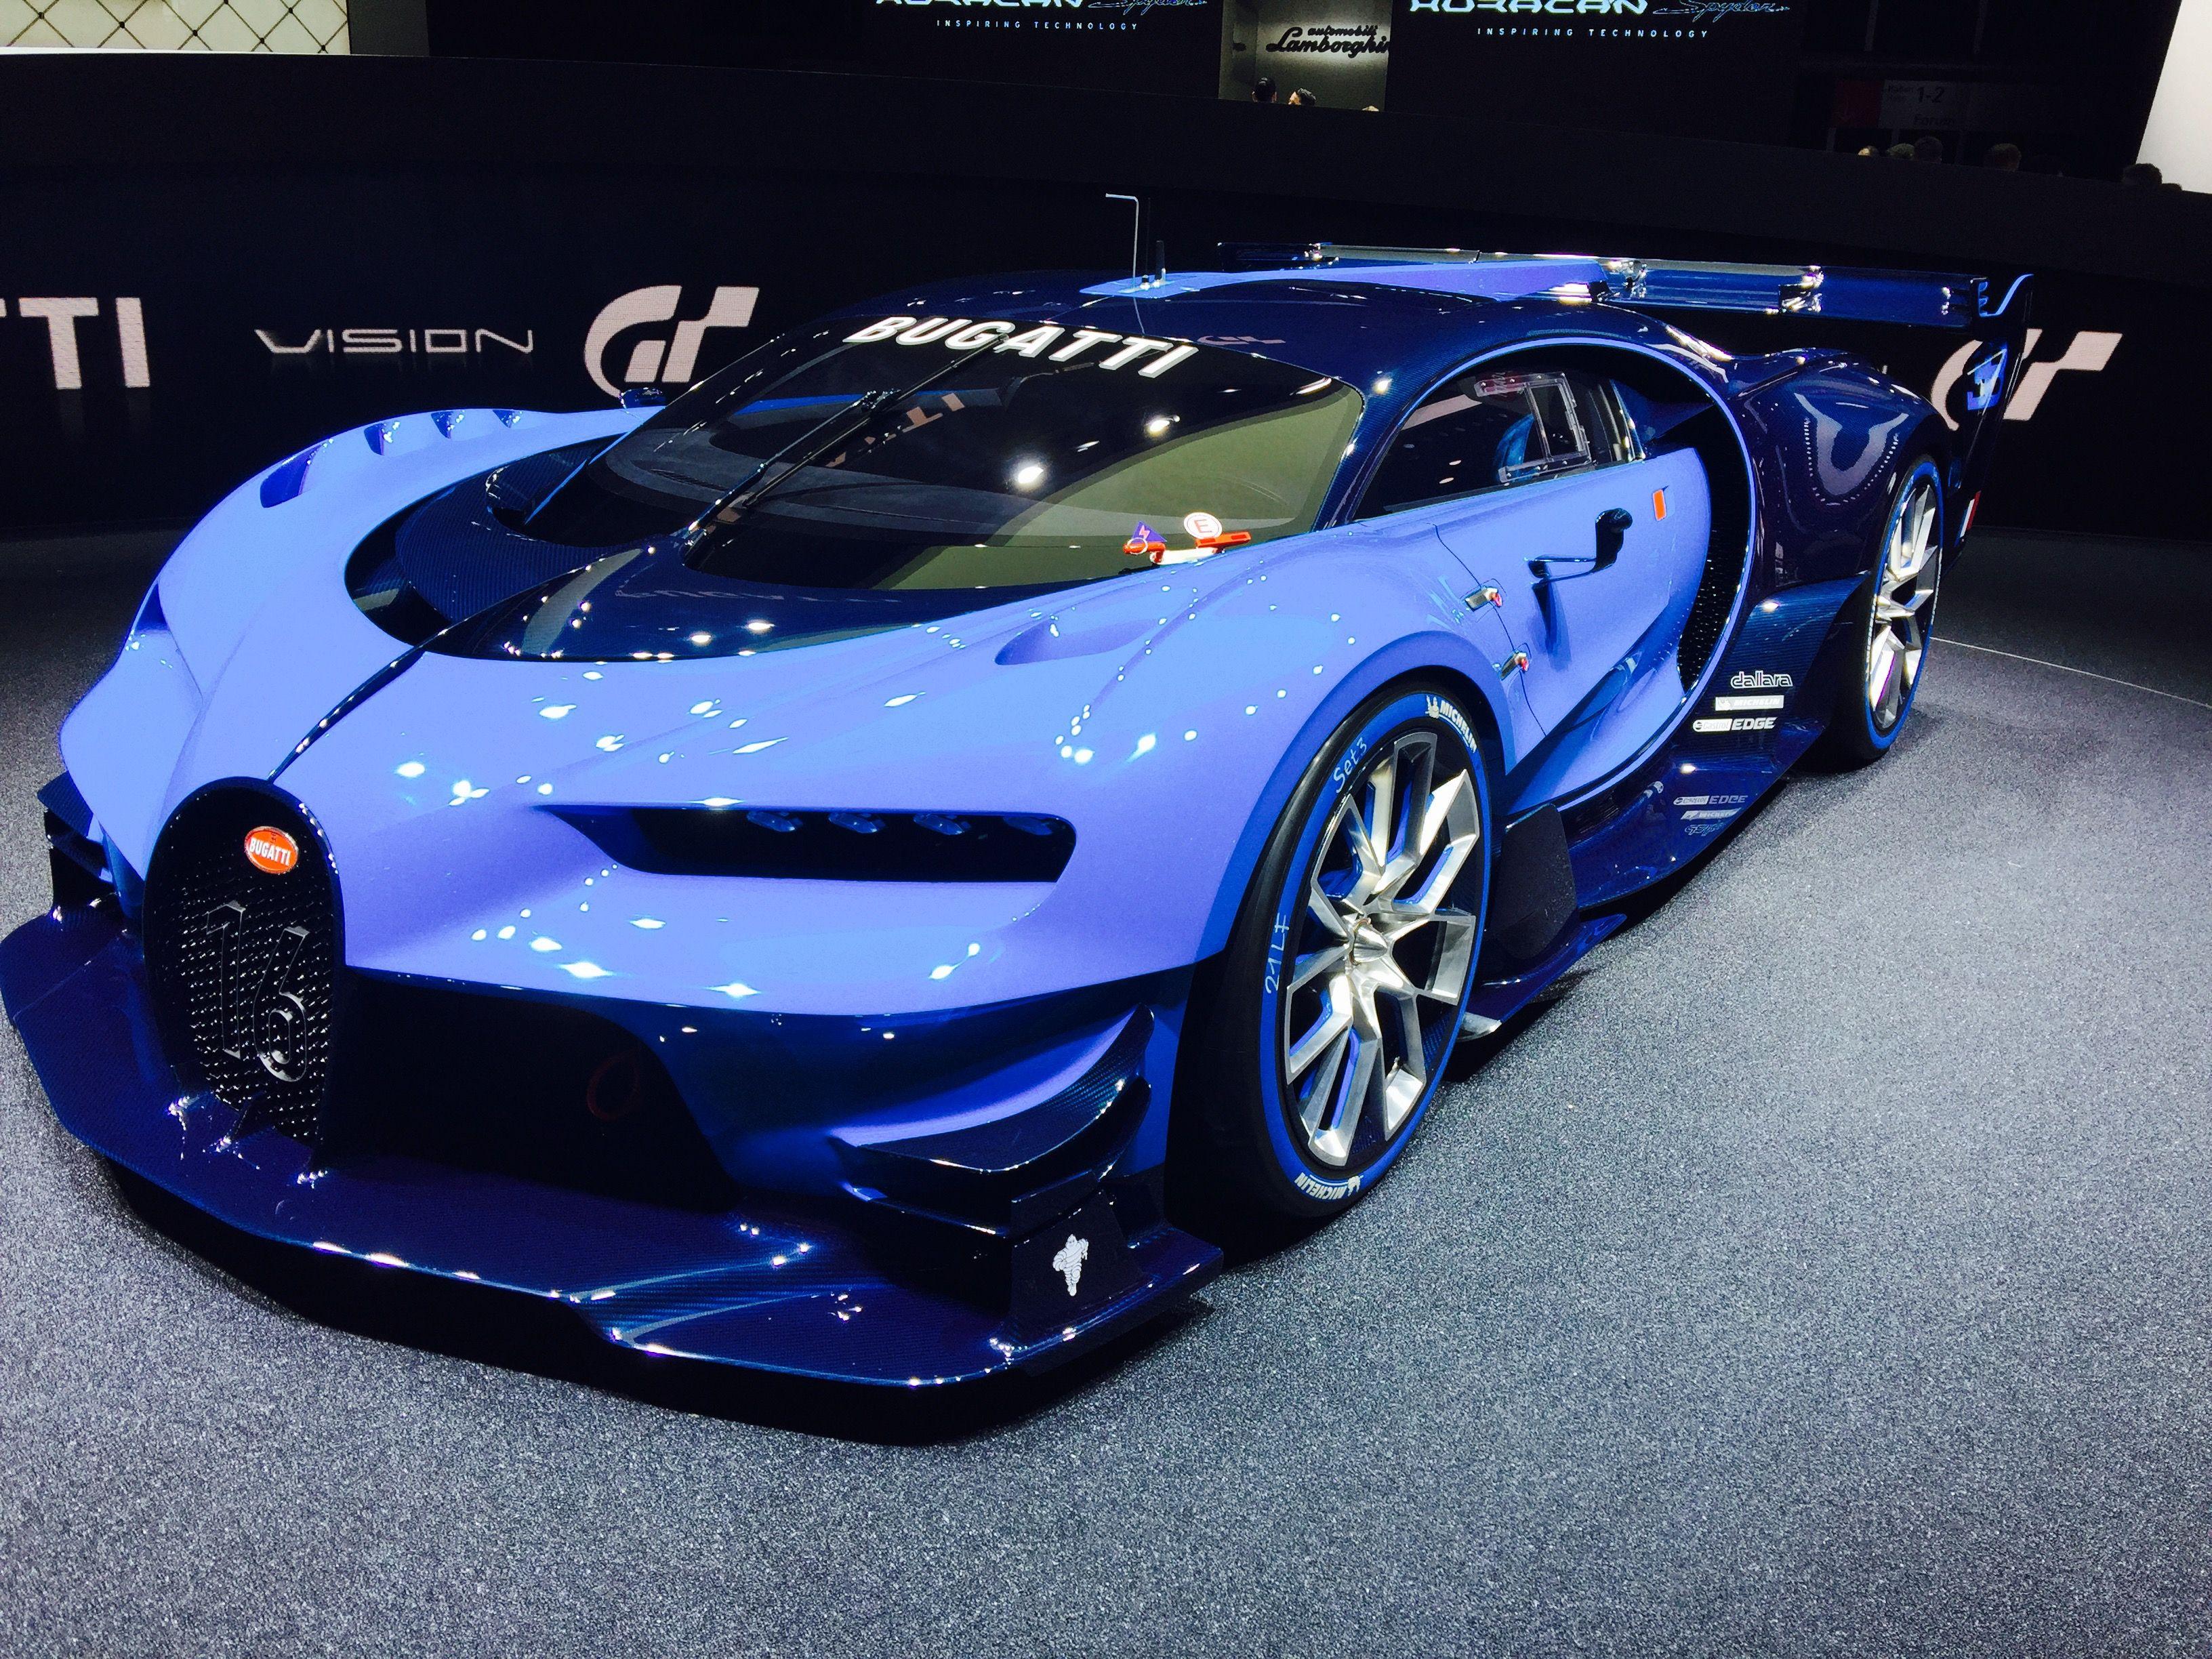 bugatti gt bugatti vision gran turismo pinterest cars sports cars and super car. Black Bedroom Furniture Sets. Home Design Ideas